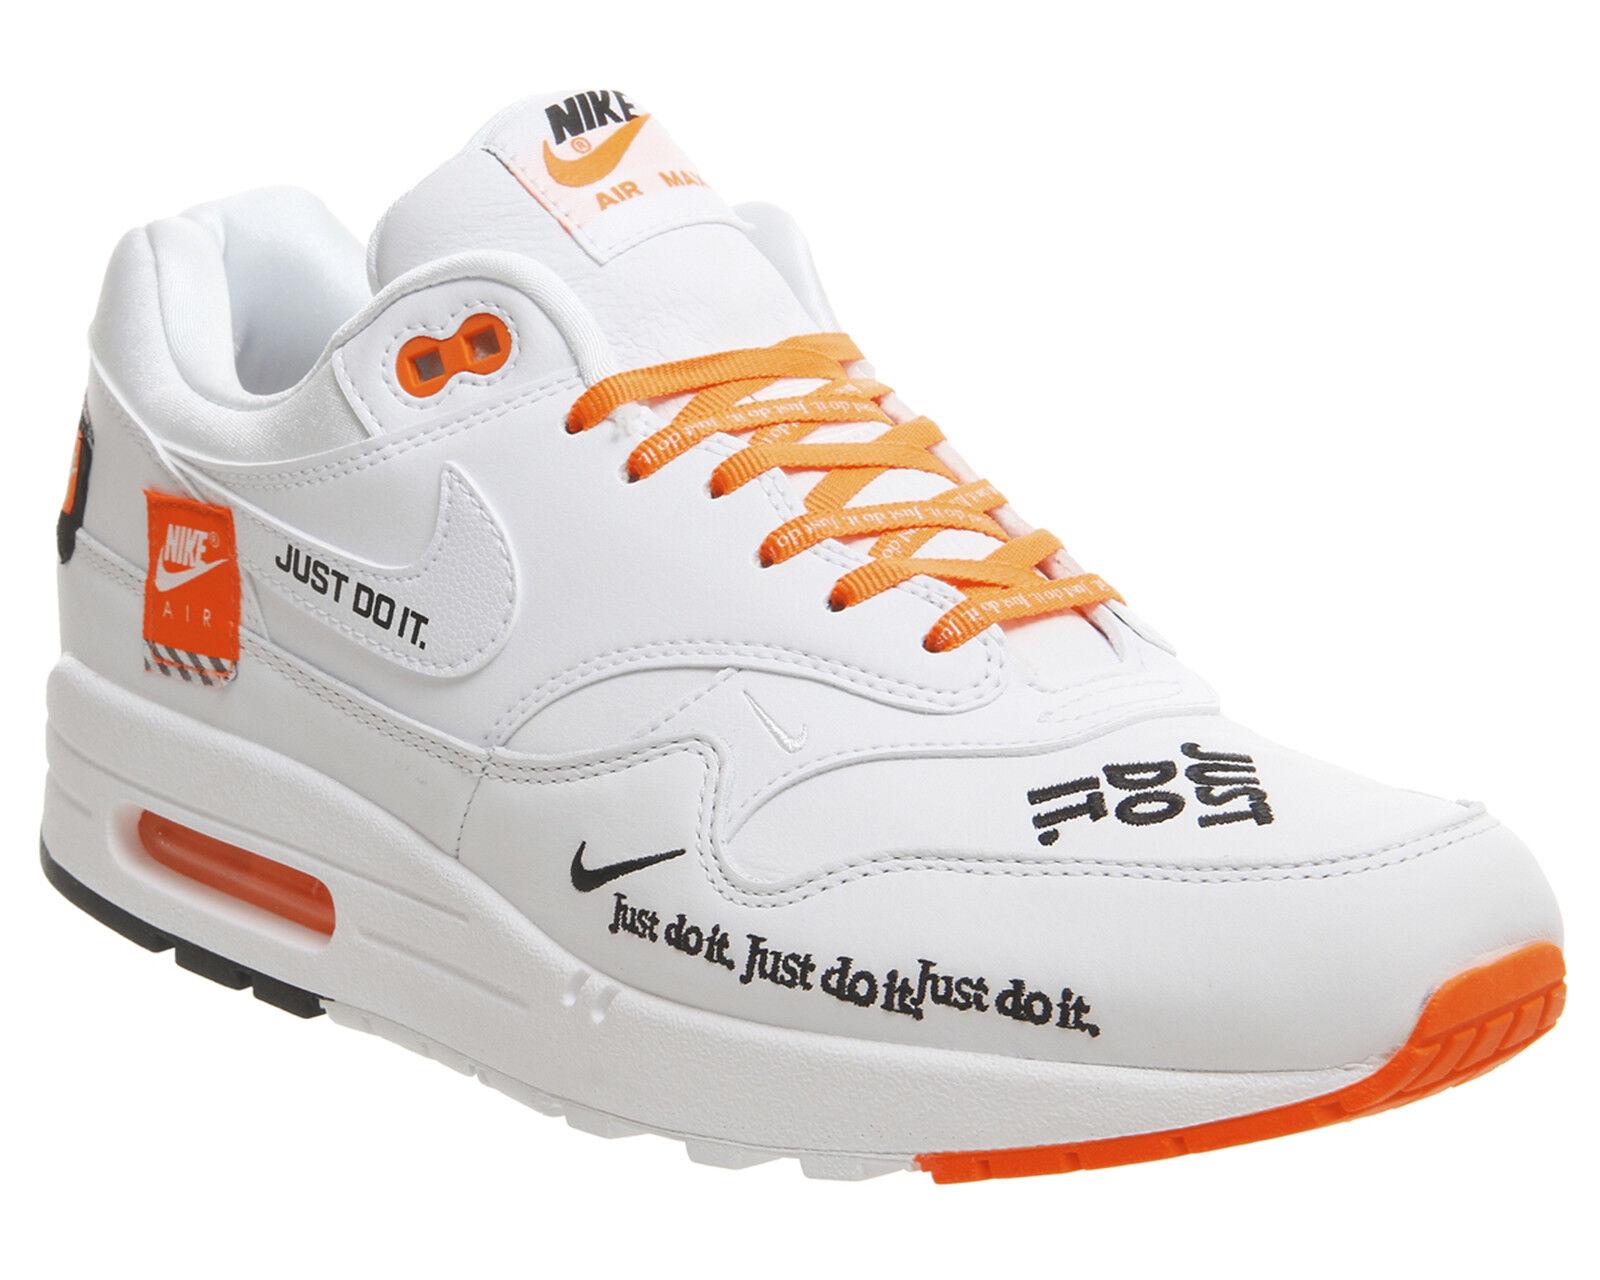 Nike AIR MAX 1 LX IT UK JUST DO 12 Bianco Bianco 12 Arancione am1 Multiuso Nuovo di Zecca b4d767